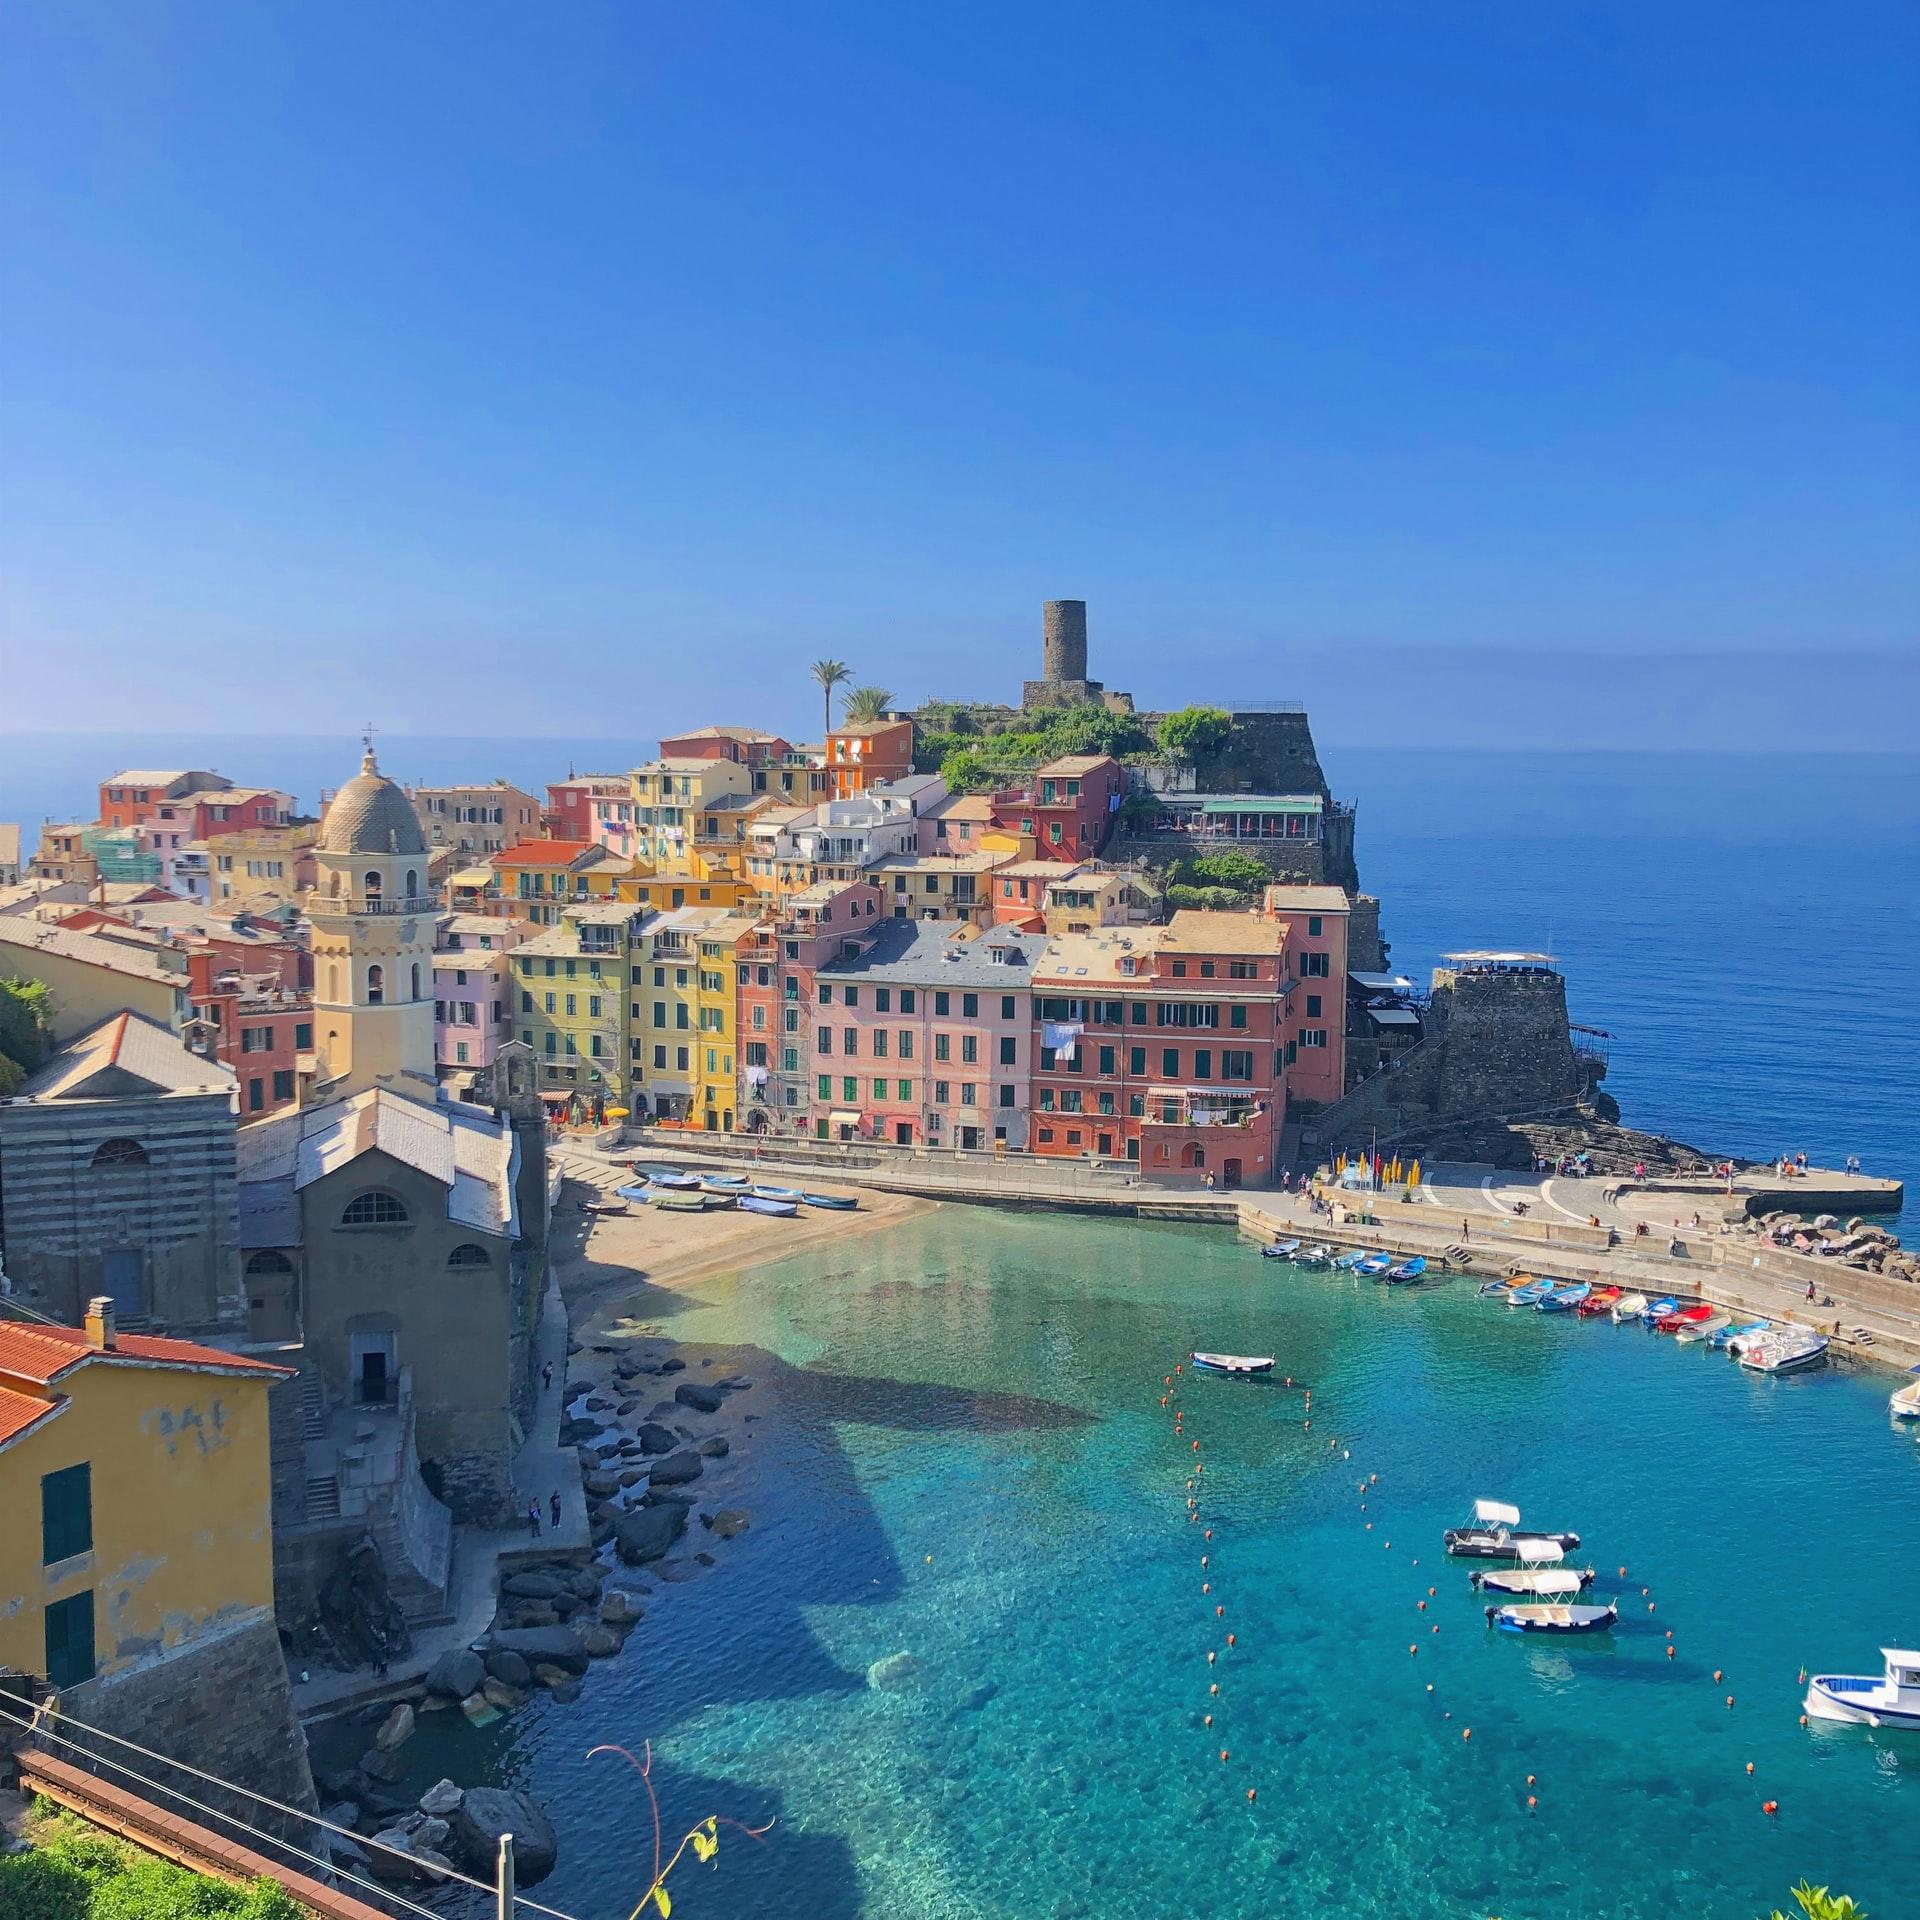 Vernazza italy, vernazza sailing, sailing in vernazza, boat rentals in vernazza